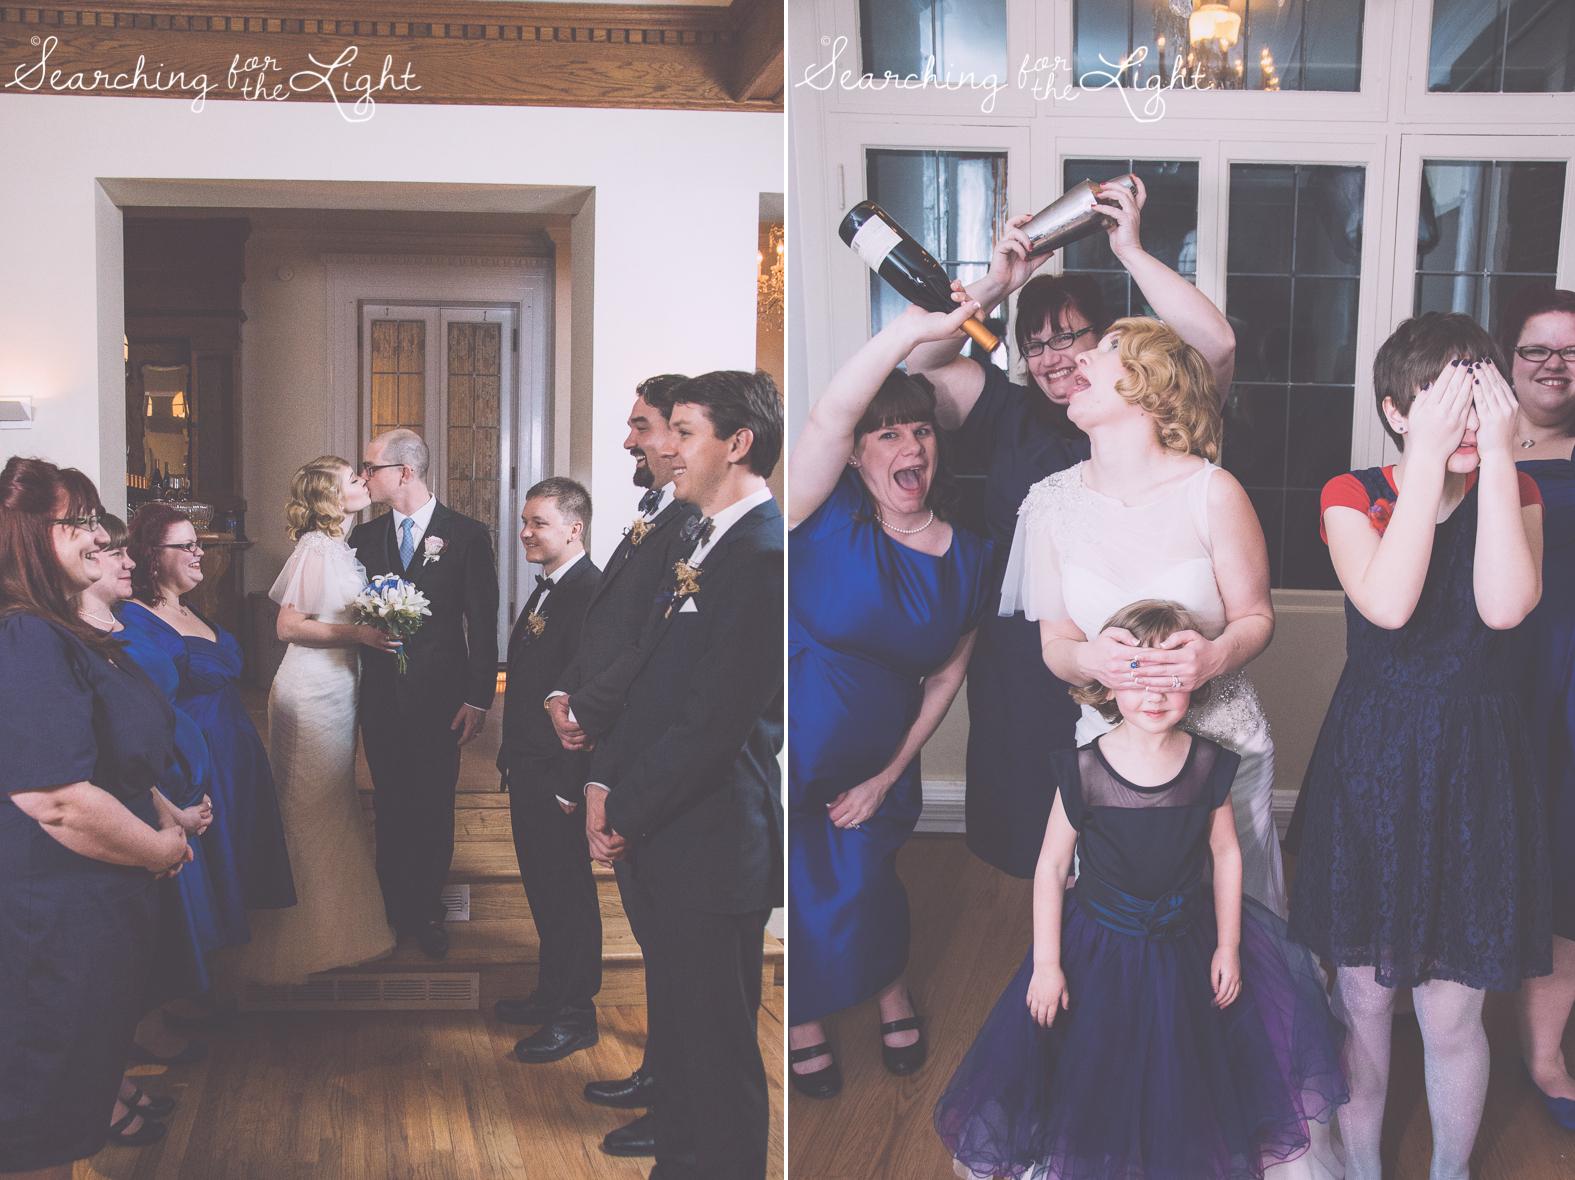 fun wedding party photos indoors Parkside mansion wedding photo by denver wedding photographer, romantic evening wedding photo, city wedding